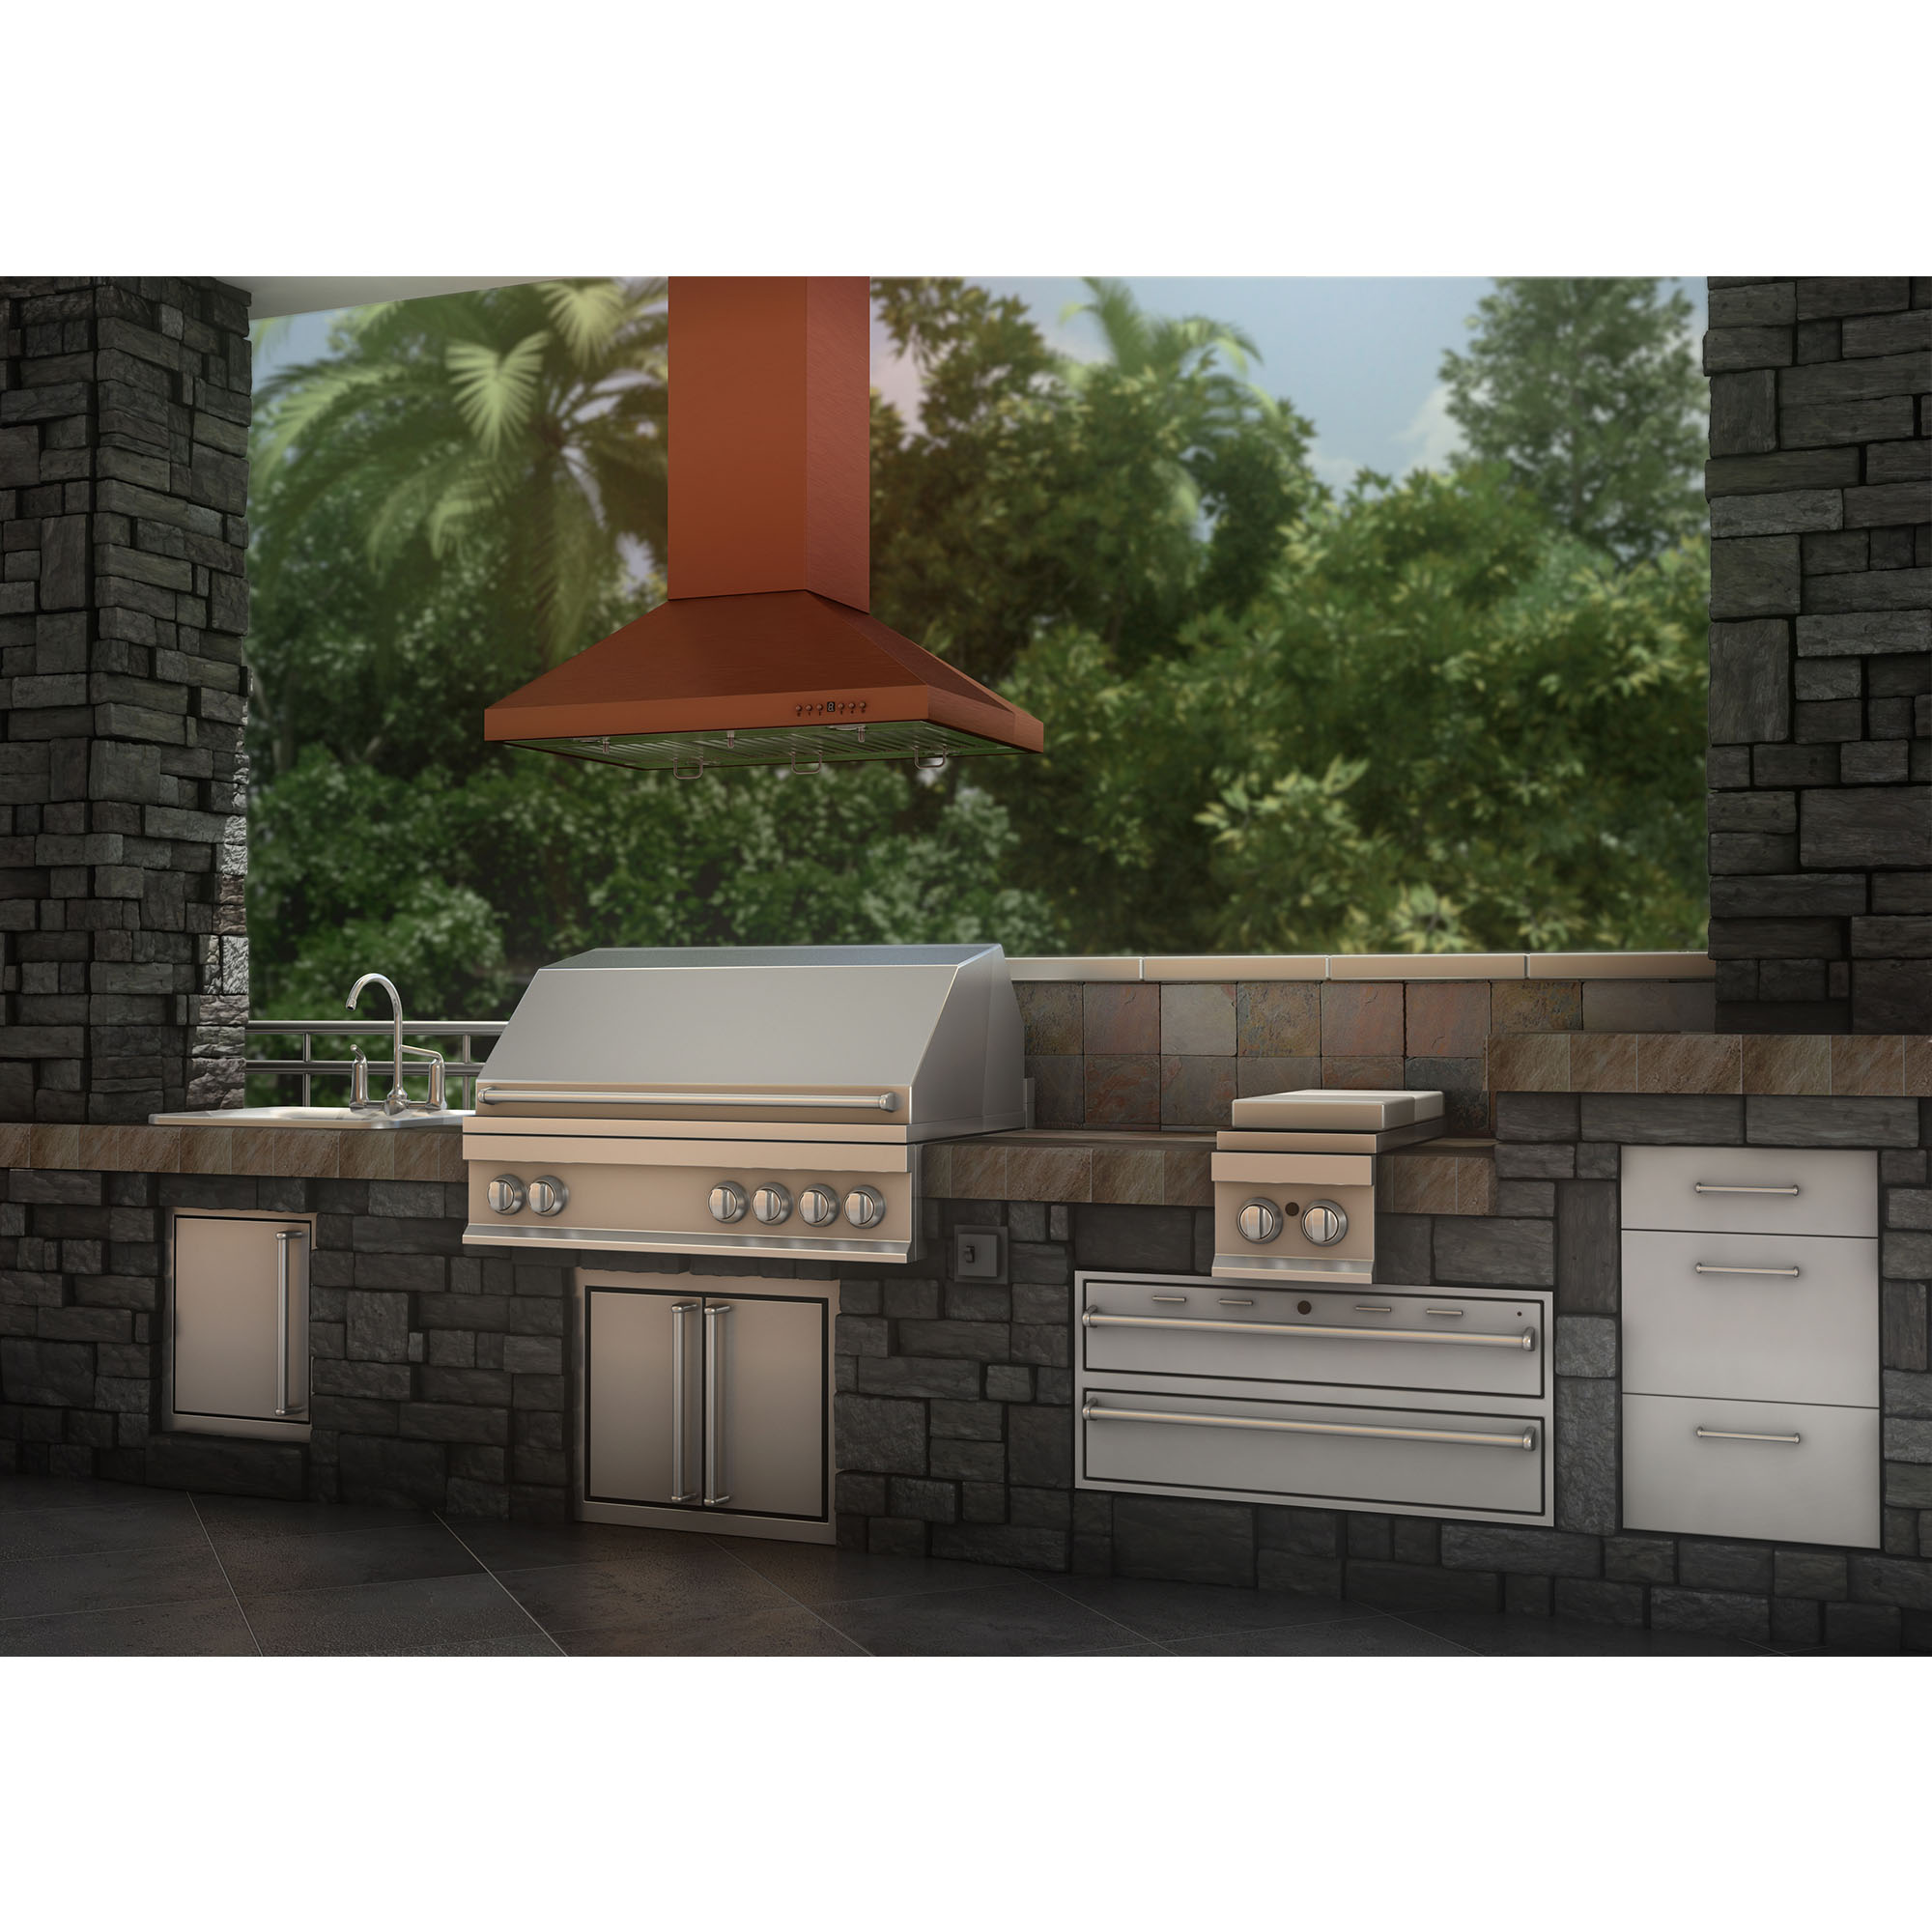 New_Copper_Island_Hood_New_Outdoor_Kitchen_Cam_01_RE.jpg